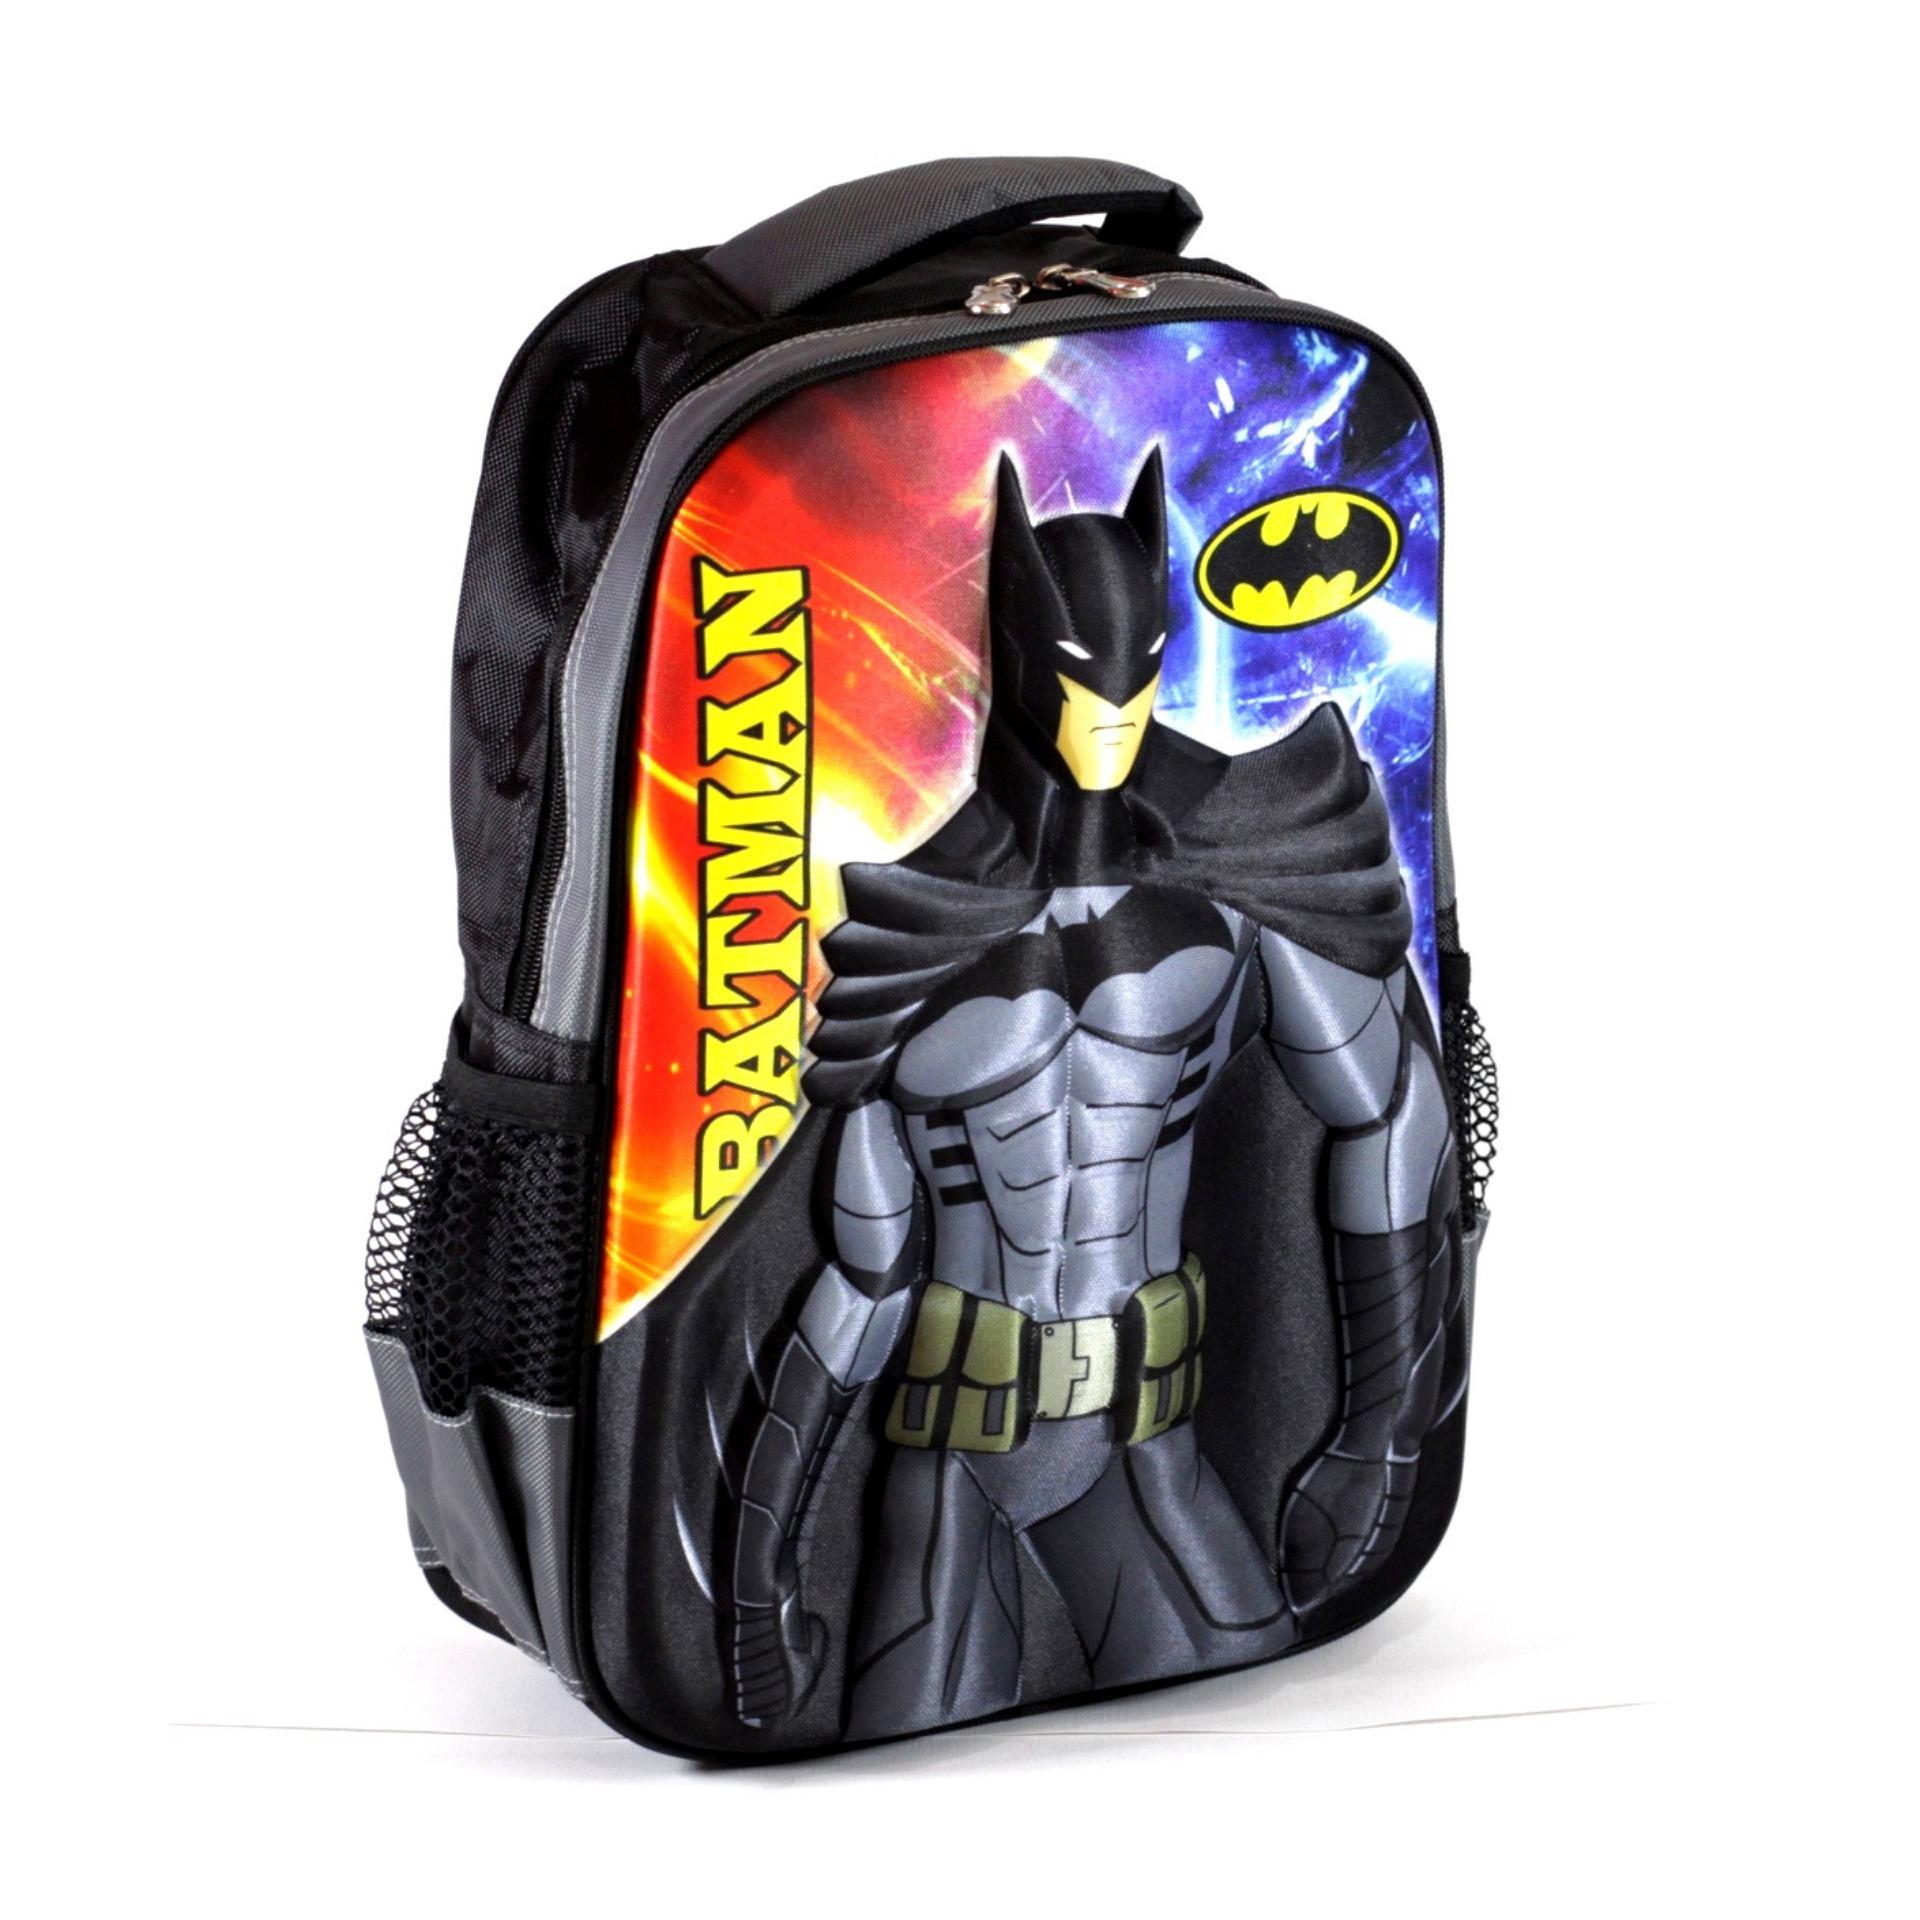 Jual Tas Sekolah Ransel Anak Tk Sd Cowok Model 3d Motif Batman Murah Set